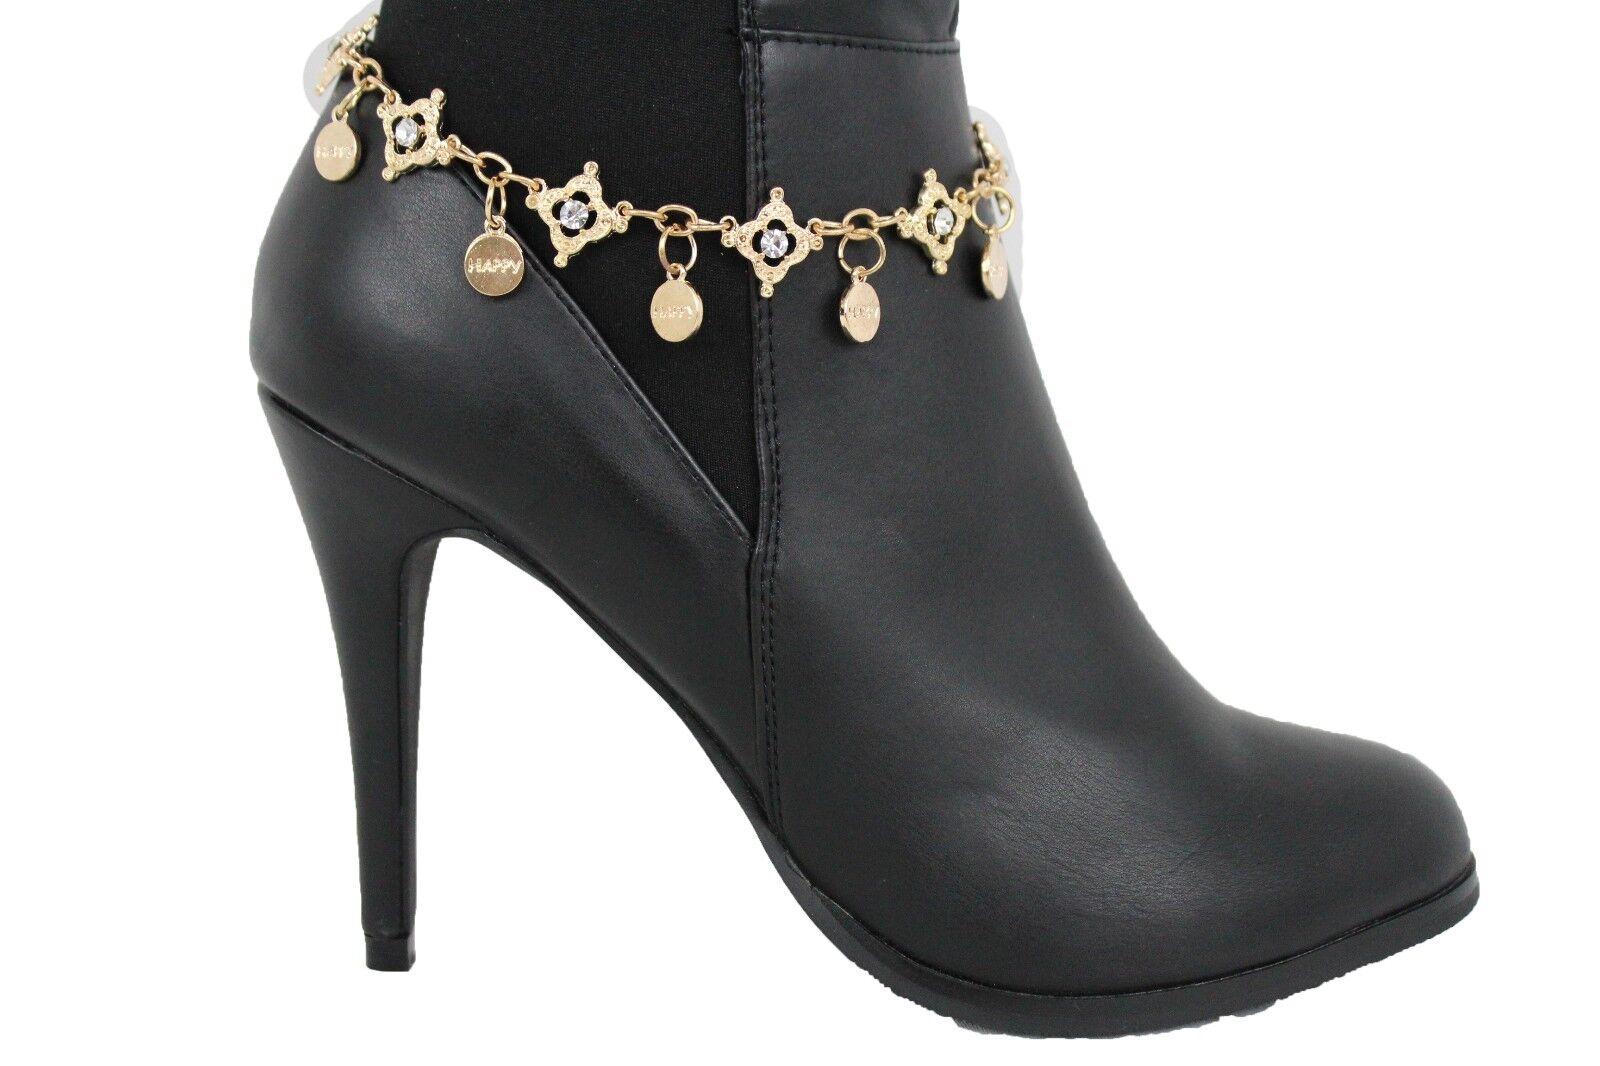 Western Women Gold Metal Chain Boot Bracelet High Heel Shoe Happy Charm Bling